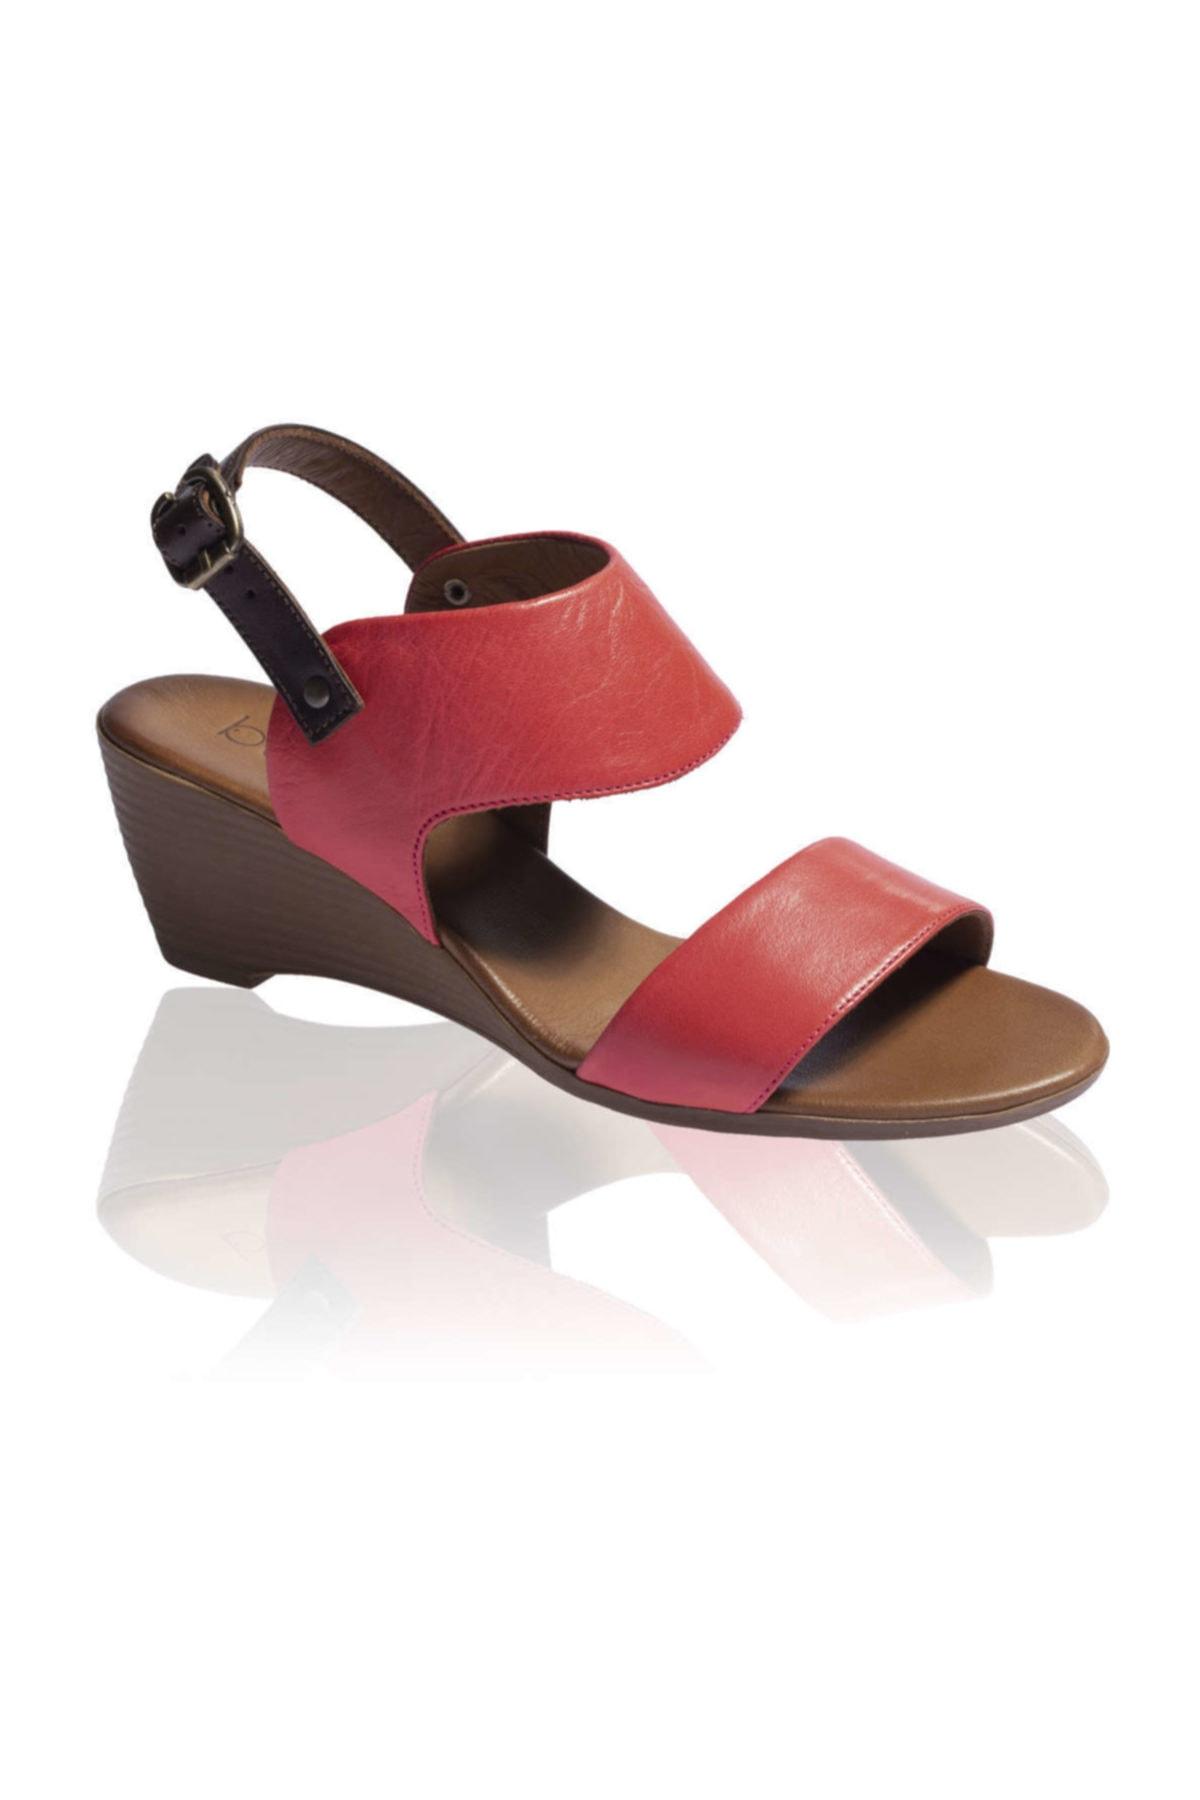 BUENO Shoes Kırmızı Bayan Sandalet 9n3700 2